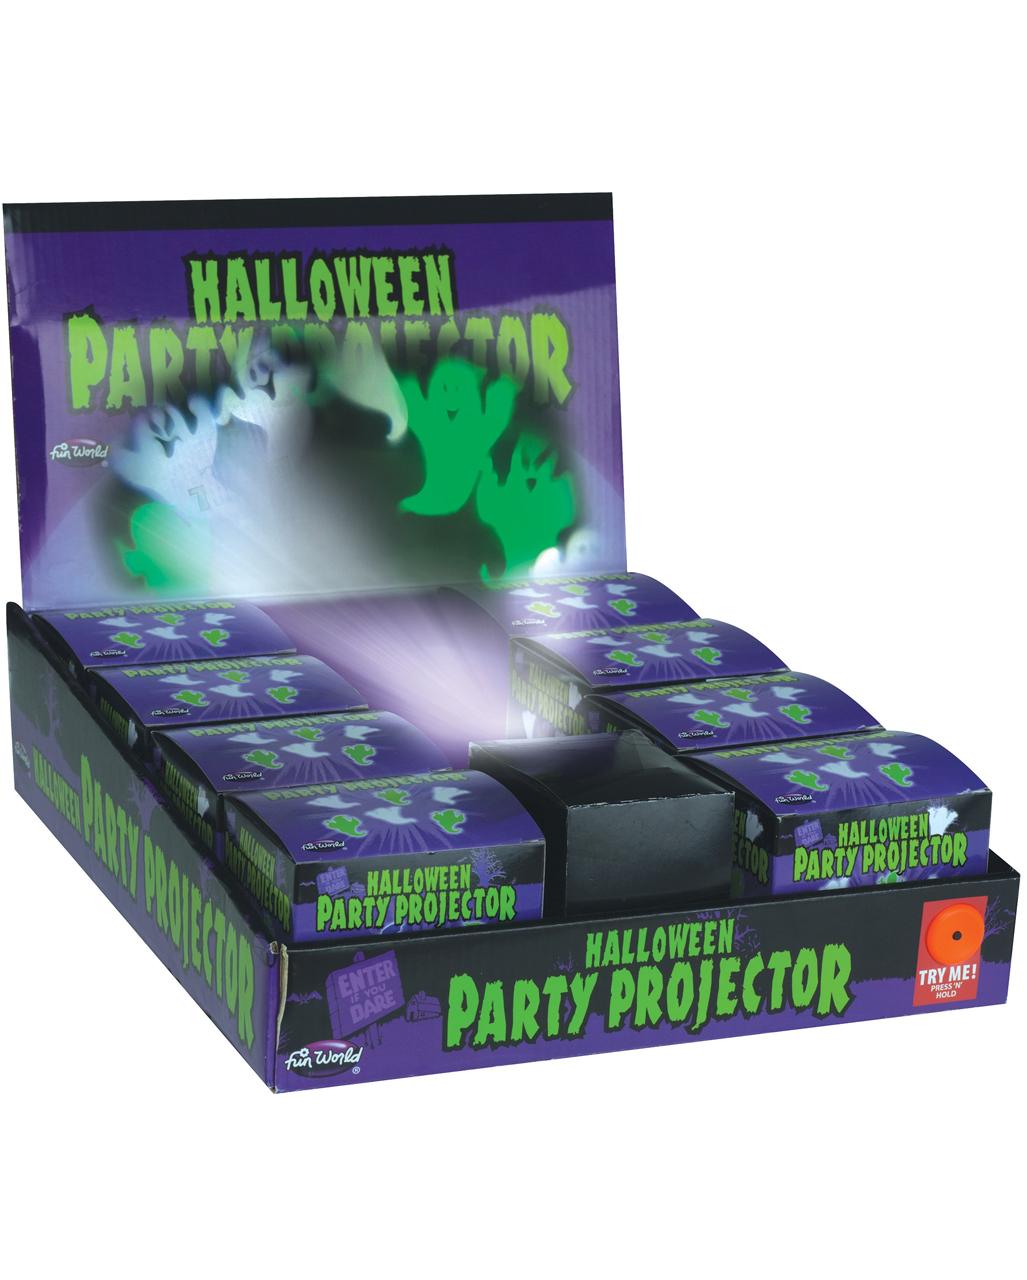 Halloween Party Projektor Geister Als Deko Kaufen Horror Shop Com